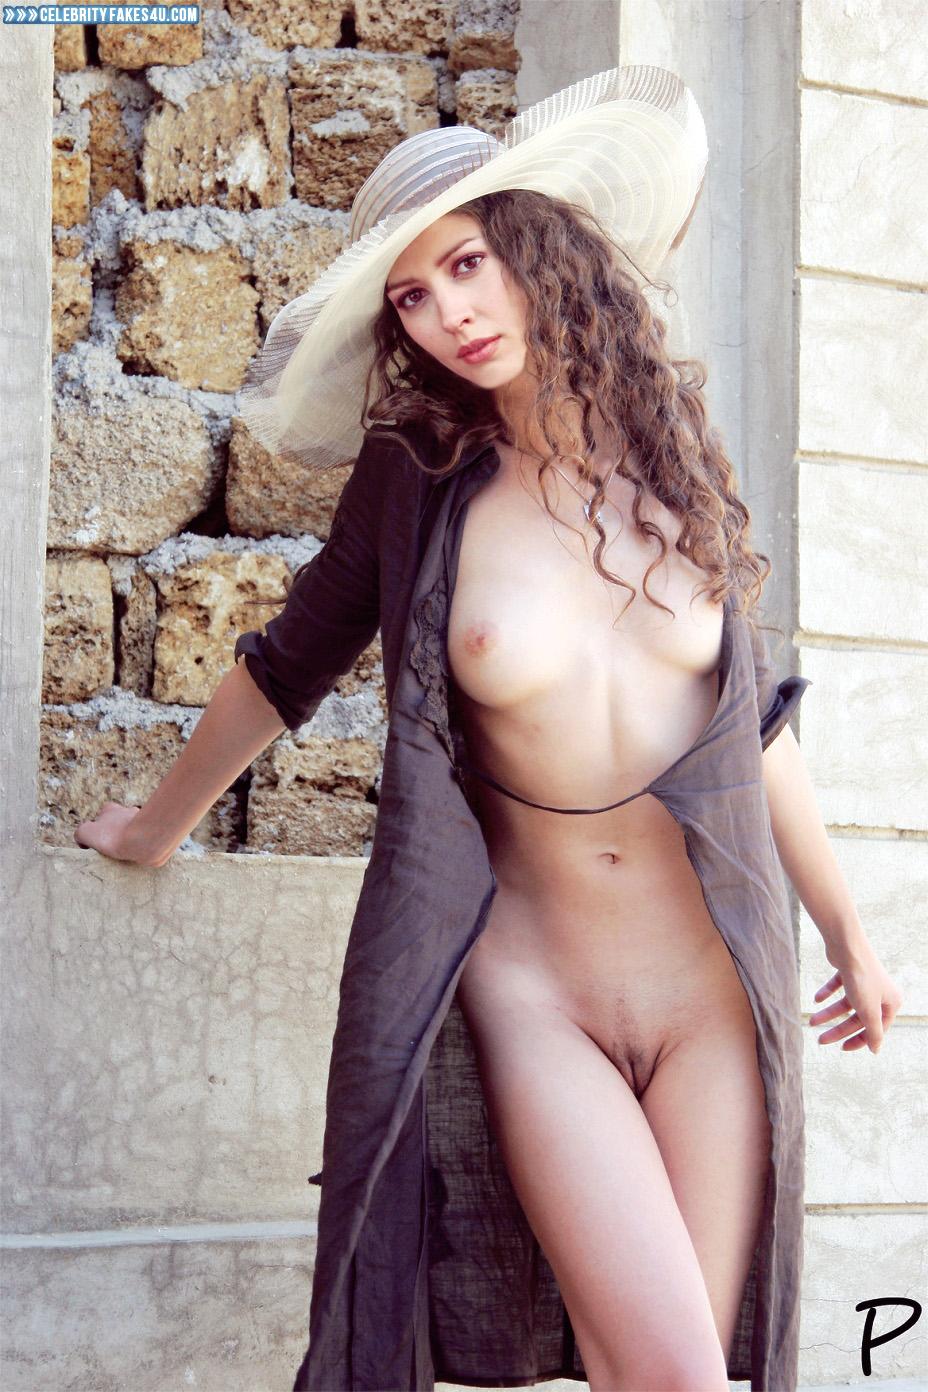 Amy Acker Nude Photos Ele amy acker nude fake-011 « celebrityfakes4u